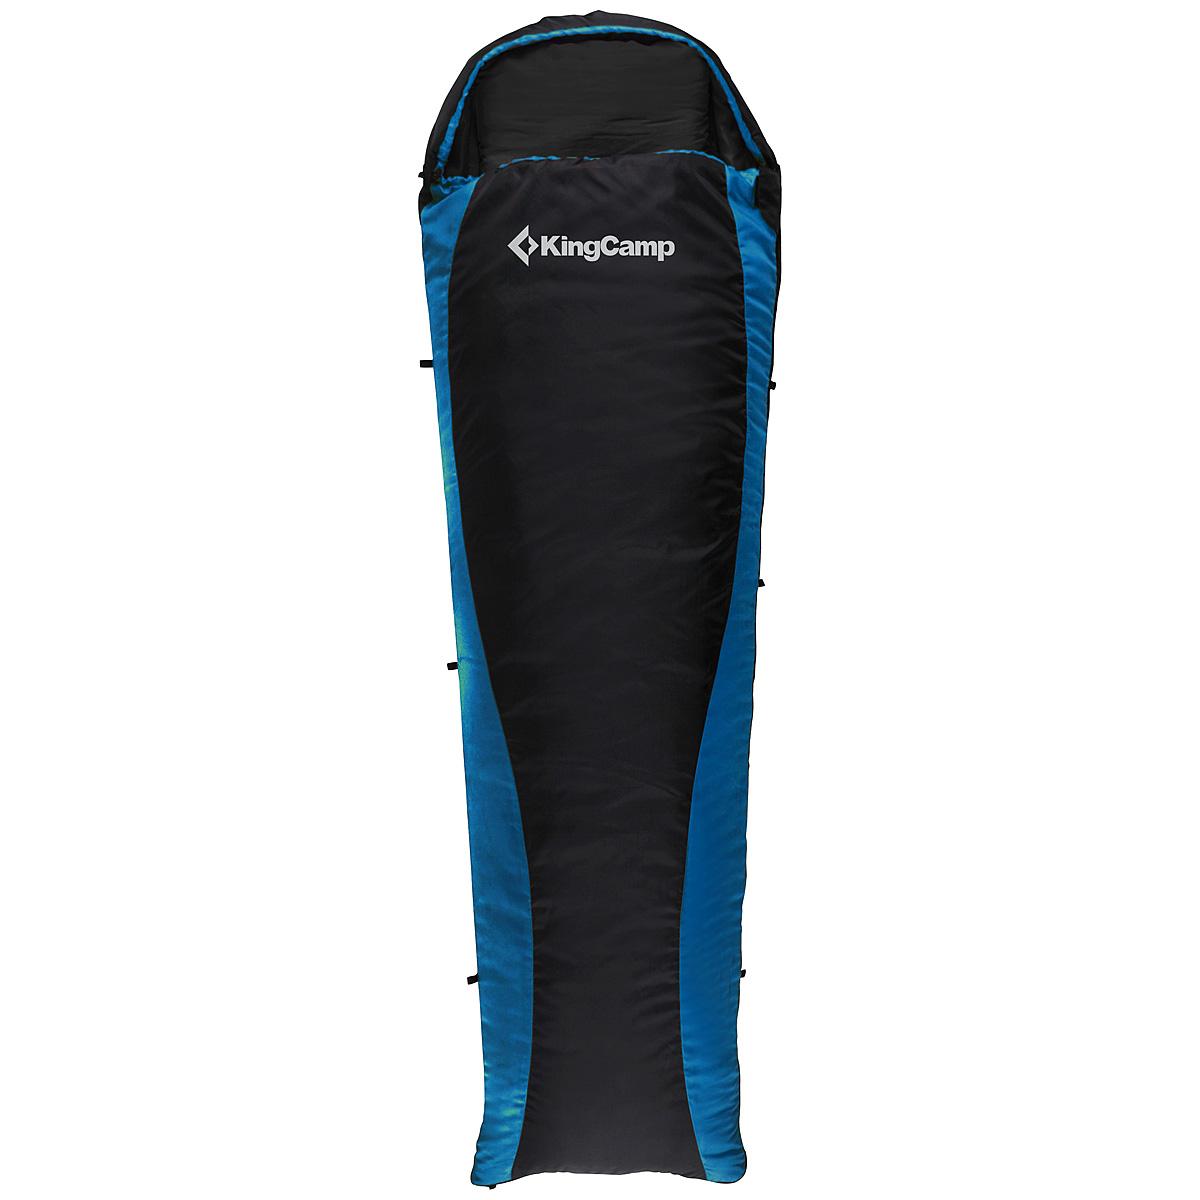 Спальный мешок-кокон KingCamp Trail 800 KS3163, левосторонняя молния, цвет: синий